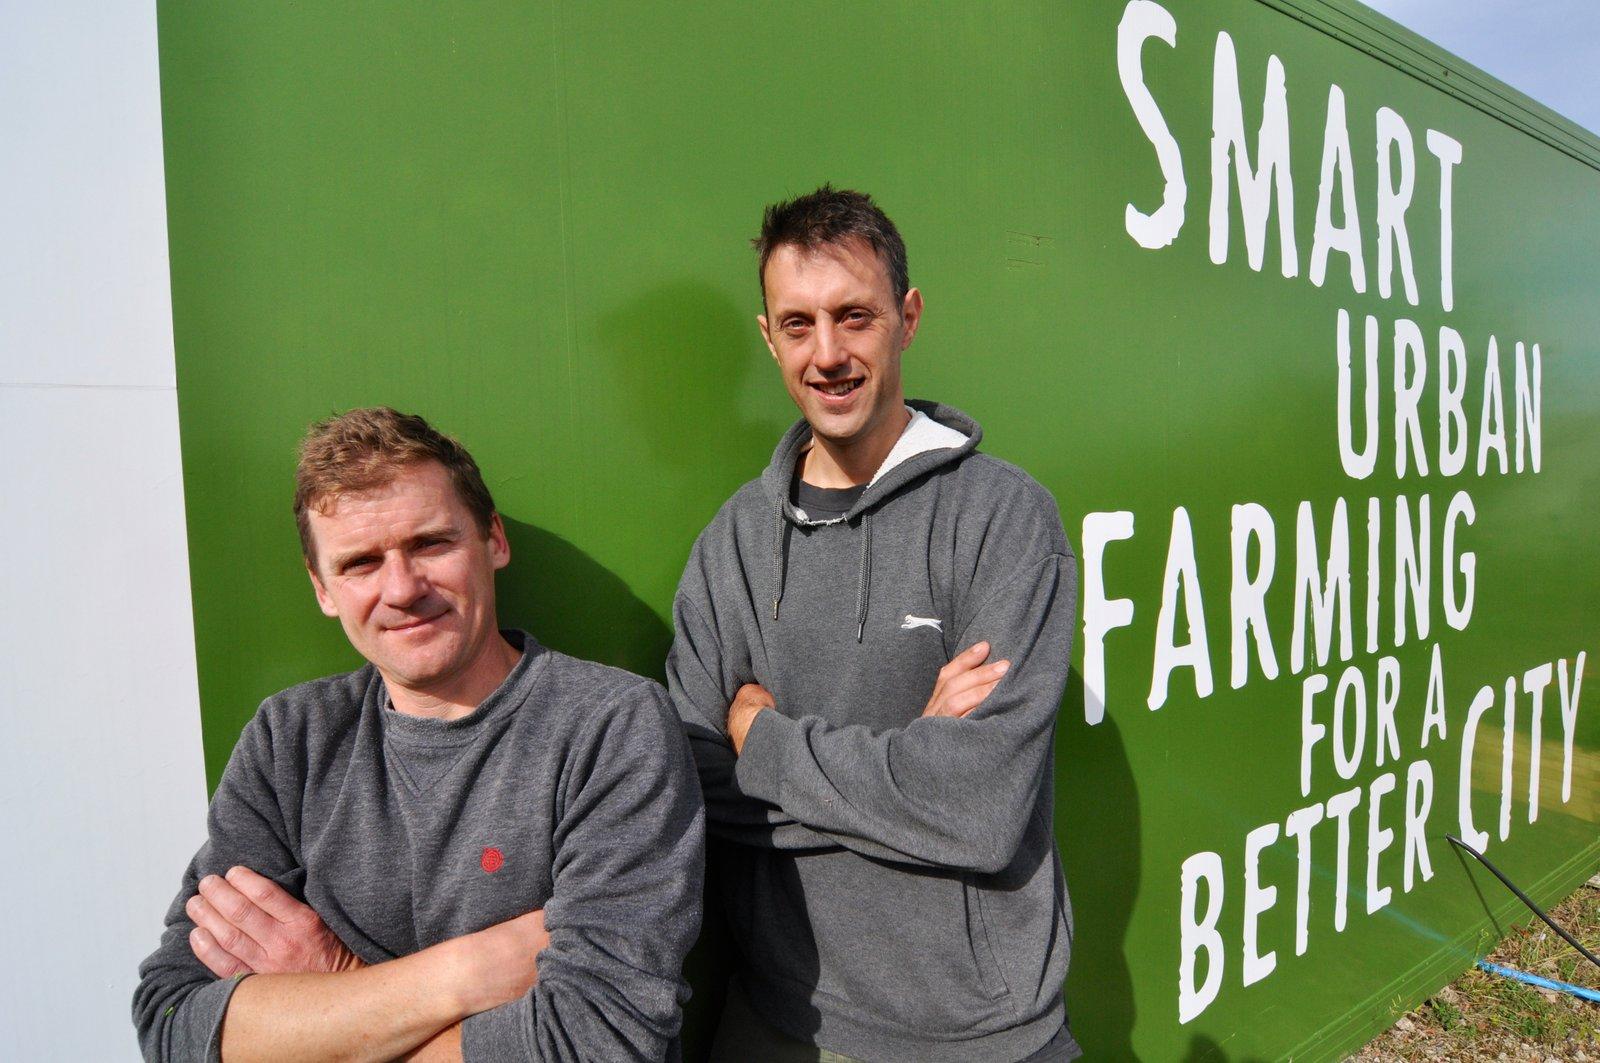 Tomorrow's social entrepreneurs graduate from Dartington